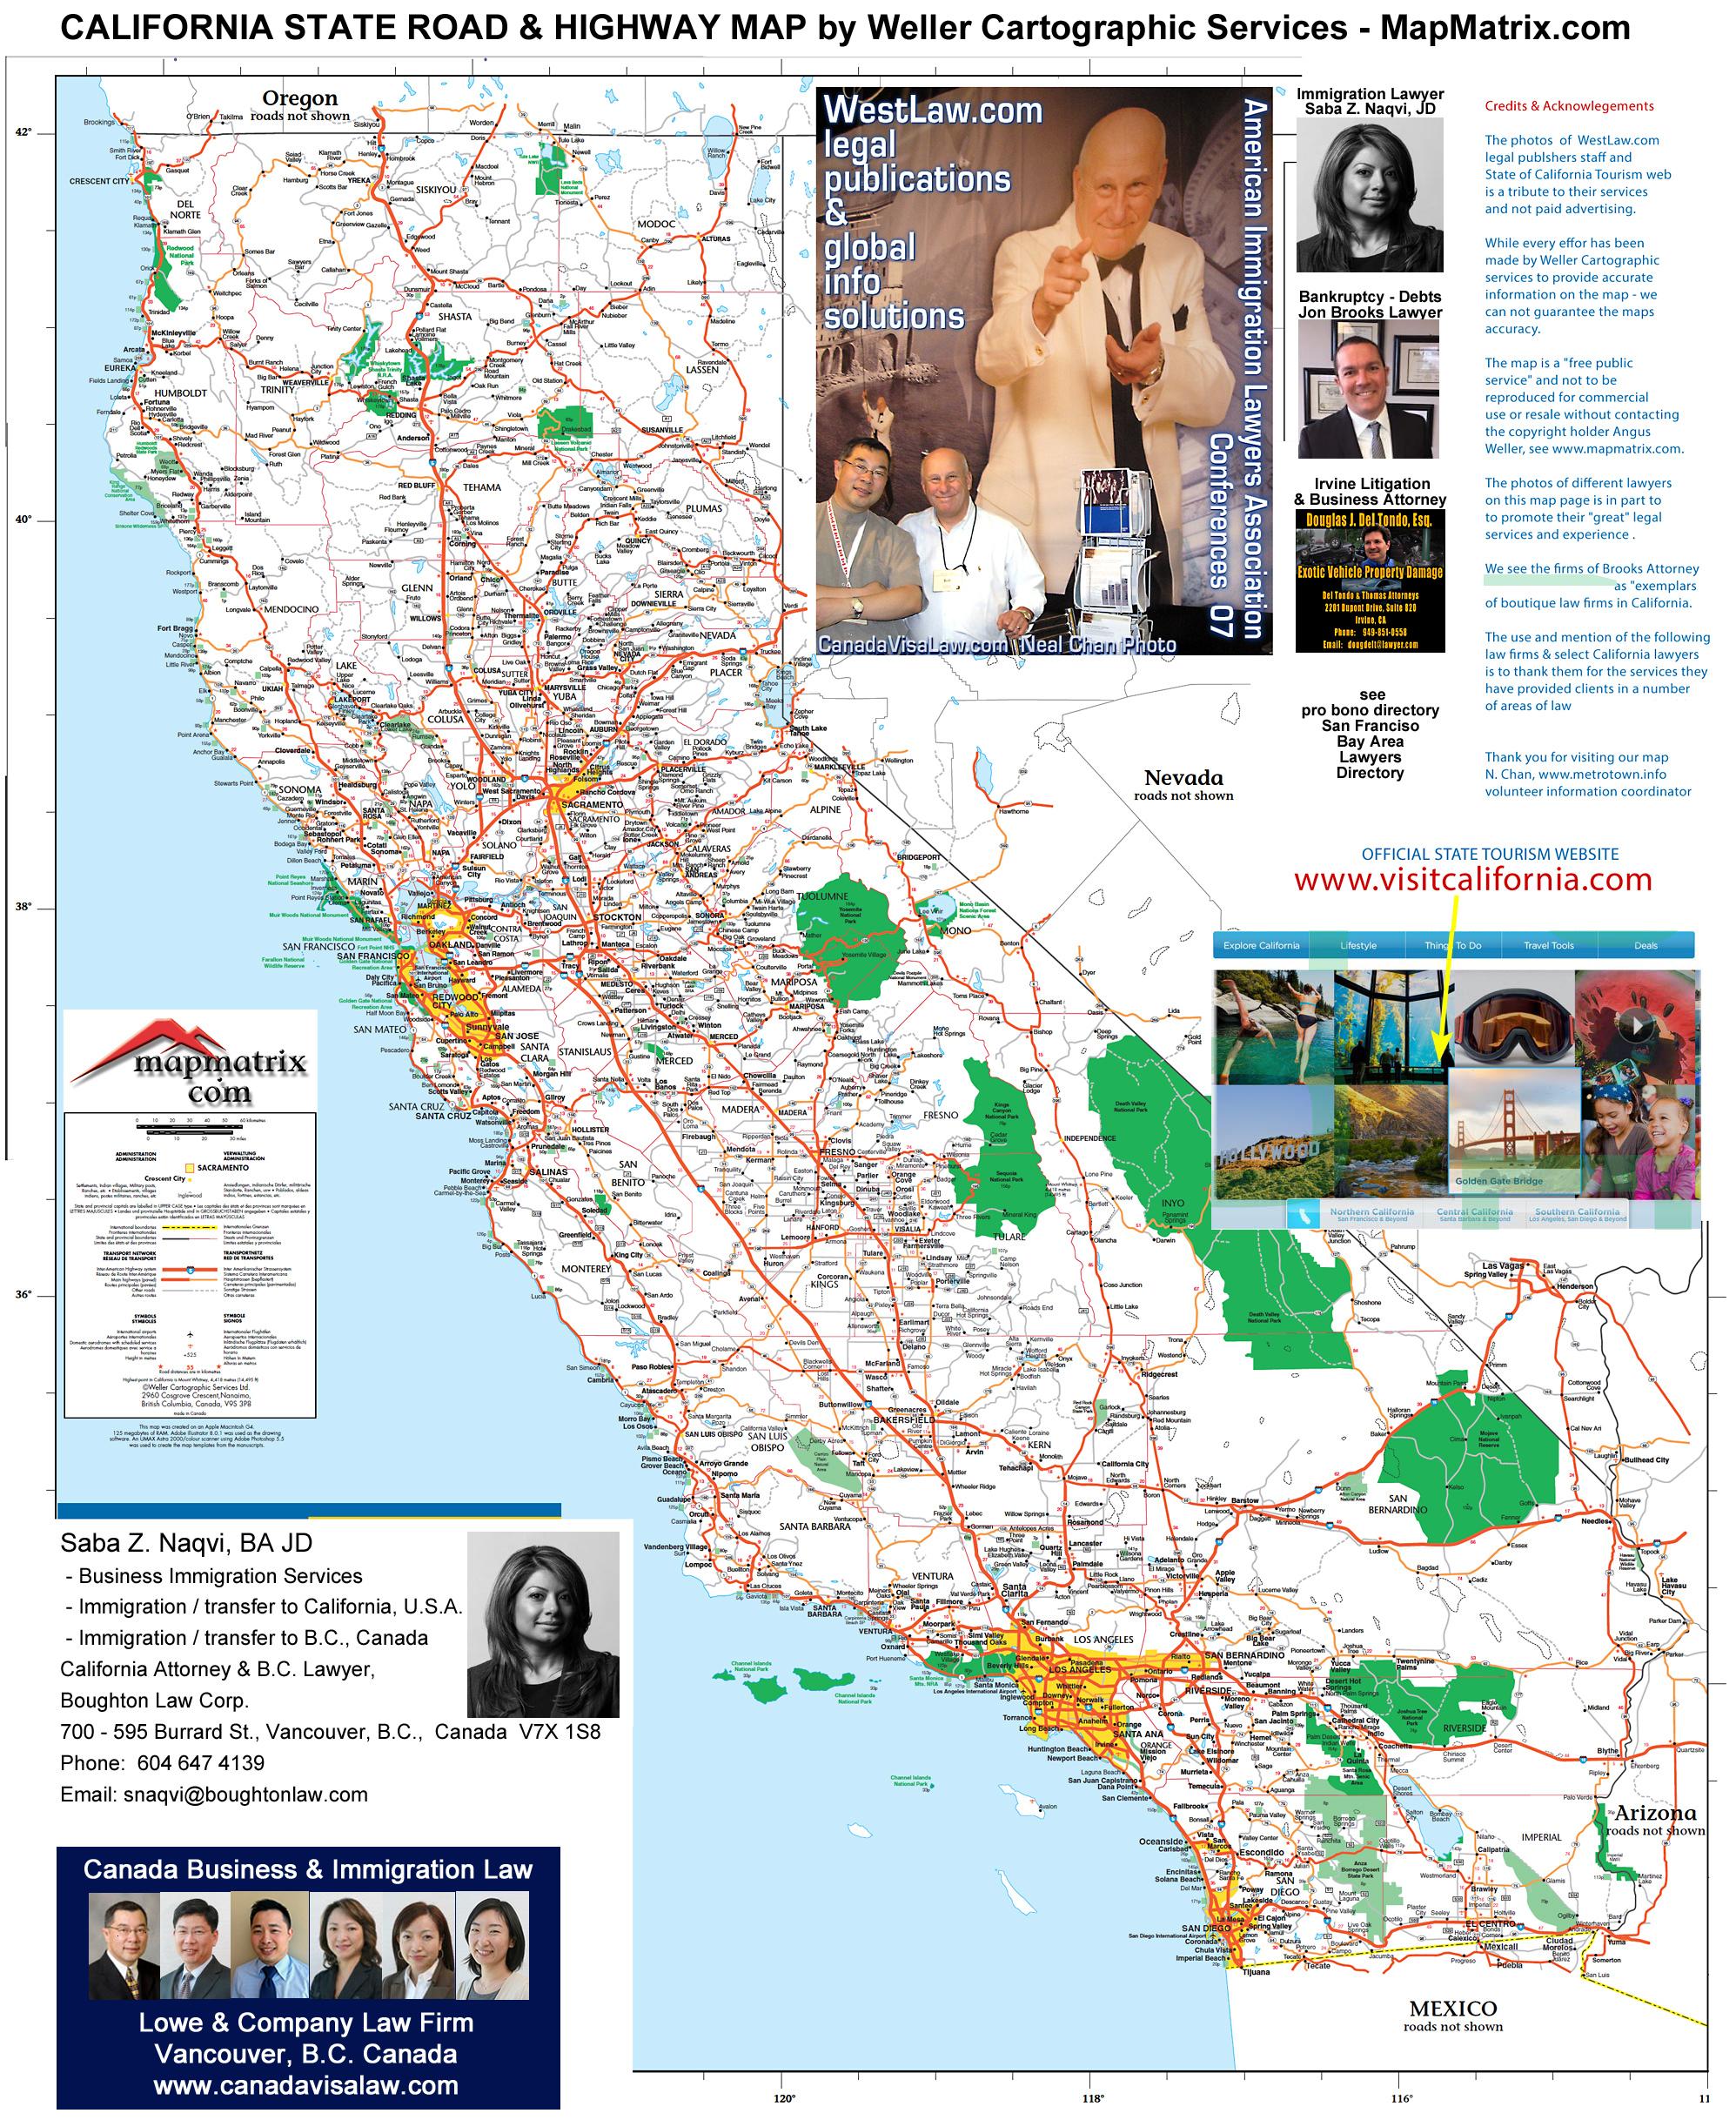 Detailed California Road / Highway Map - [2000 Pix Wide - 3 Meg - California Oregon Border Map